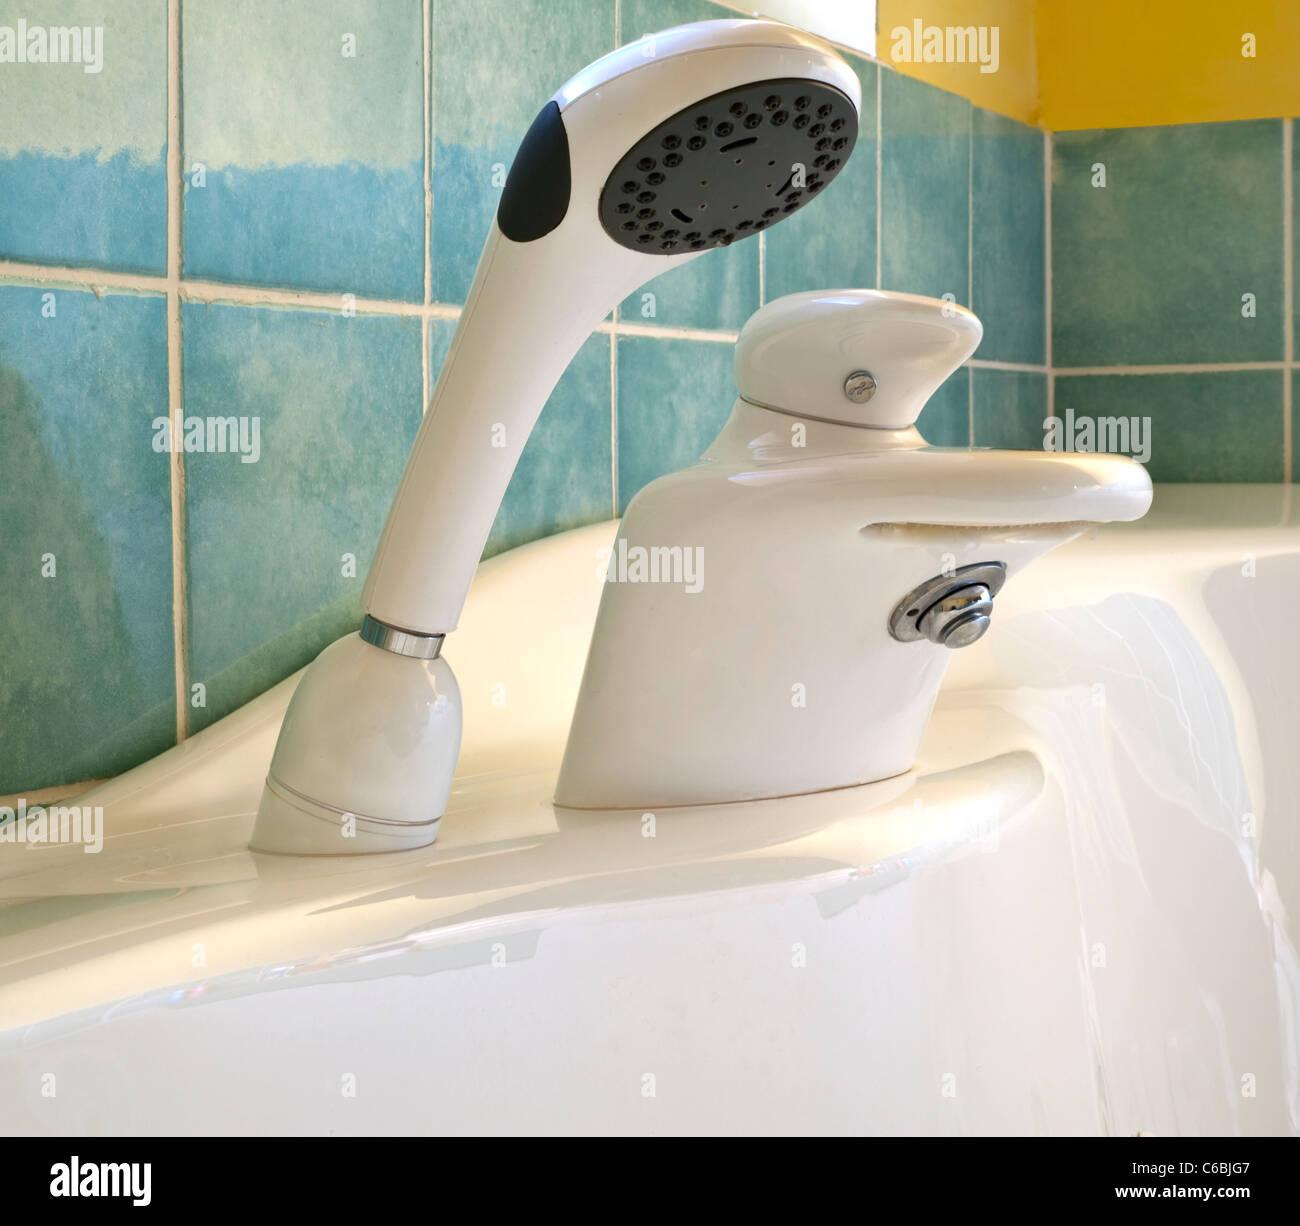 furniture of Modern Bathroom Accessories Stock Photo: 38364711 - Alamy